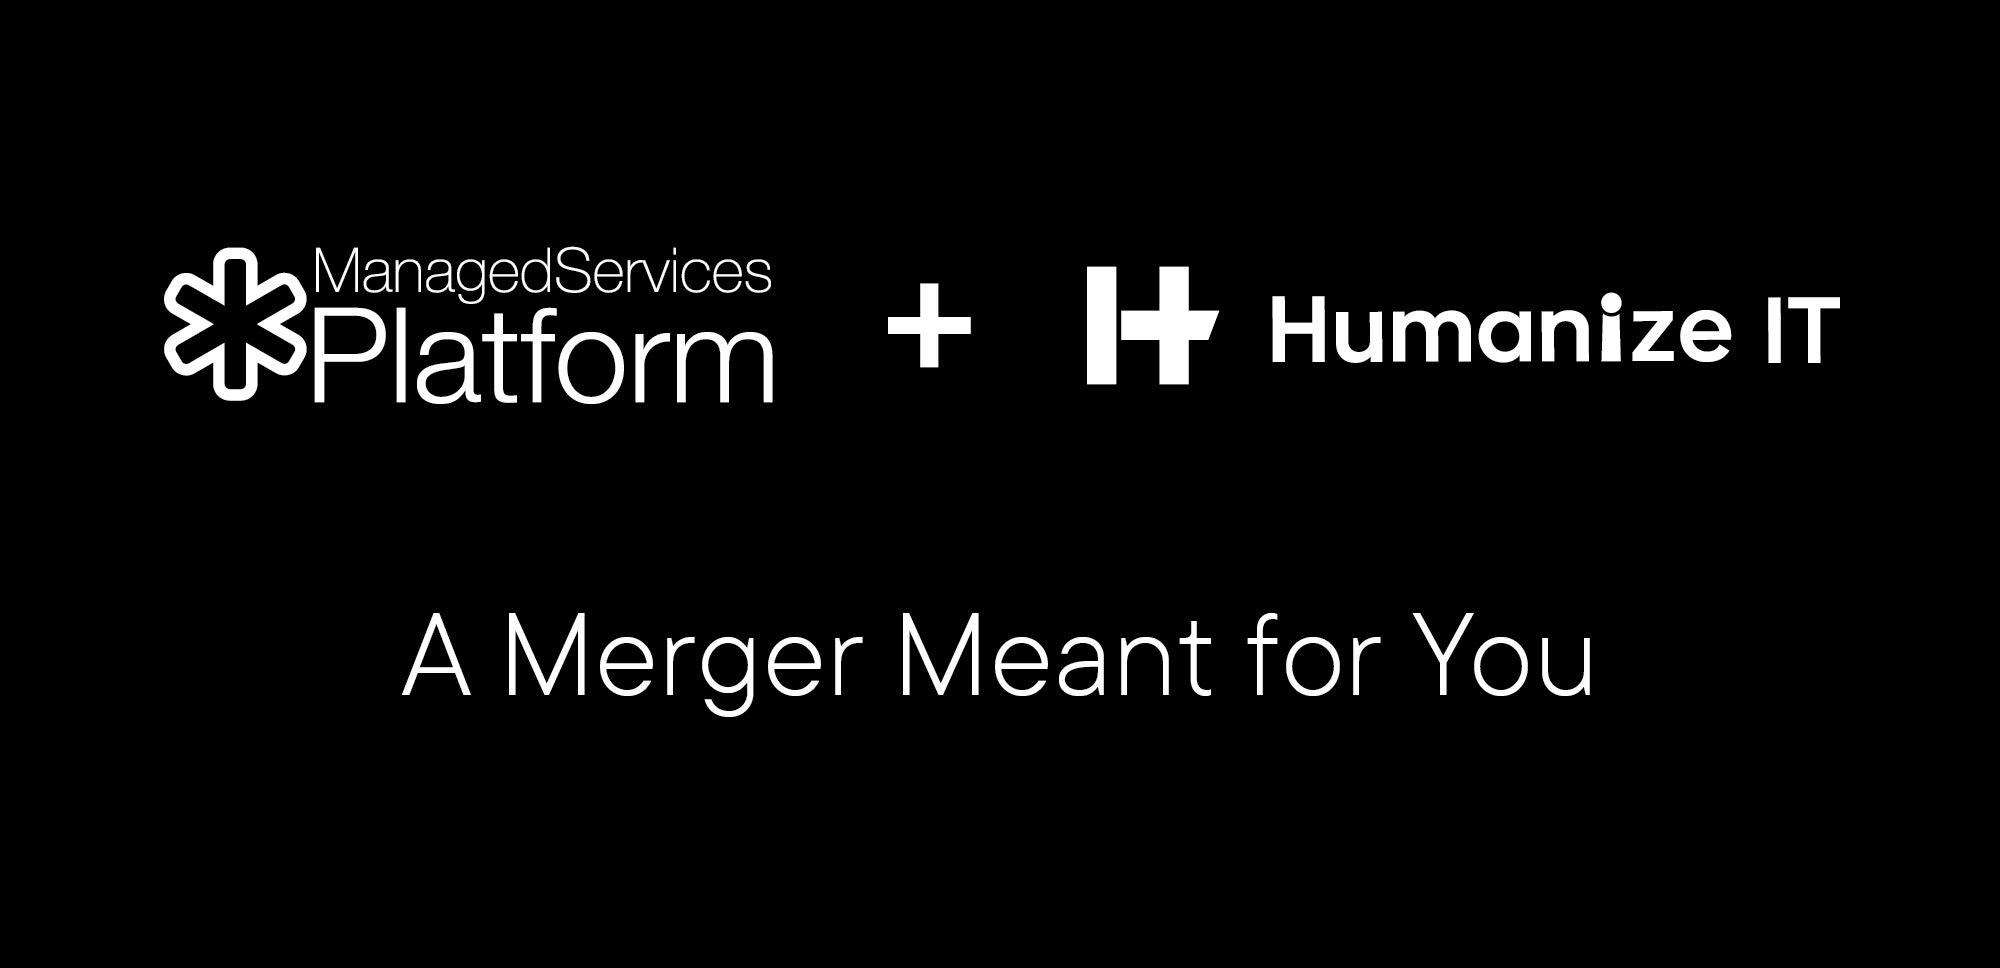 Managed Services Platform + Humnaize IT